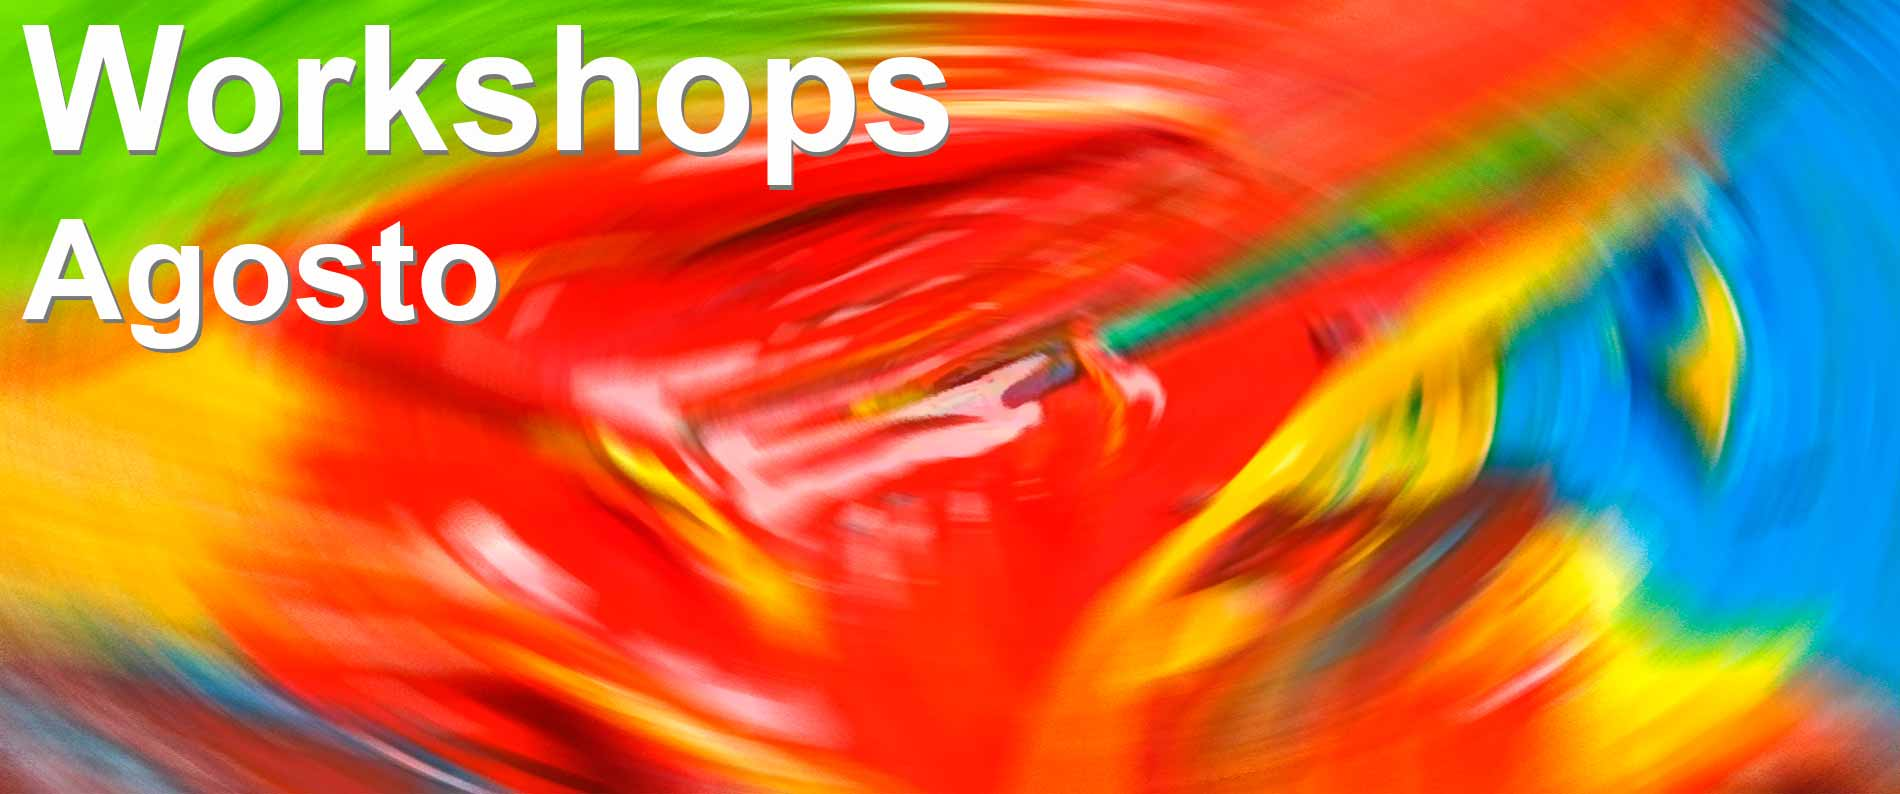 workshops agosto - talleres de agosto de diseño gráfico